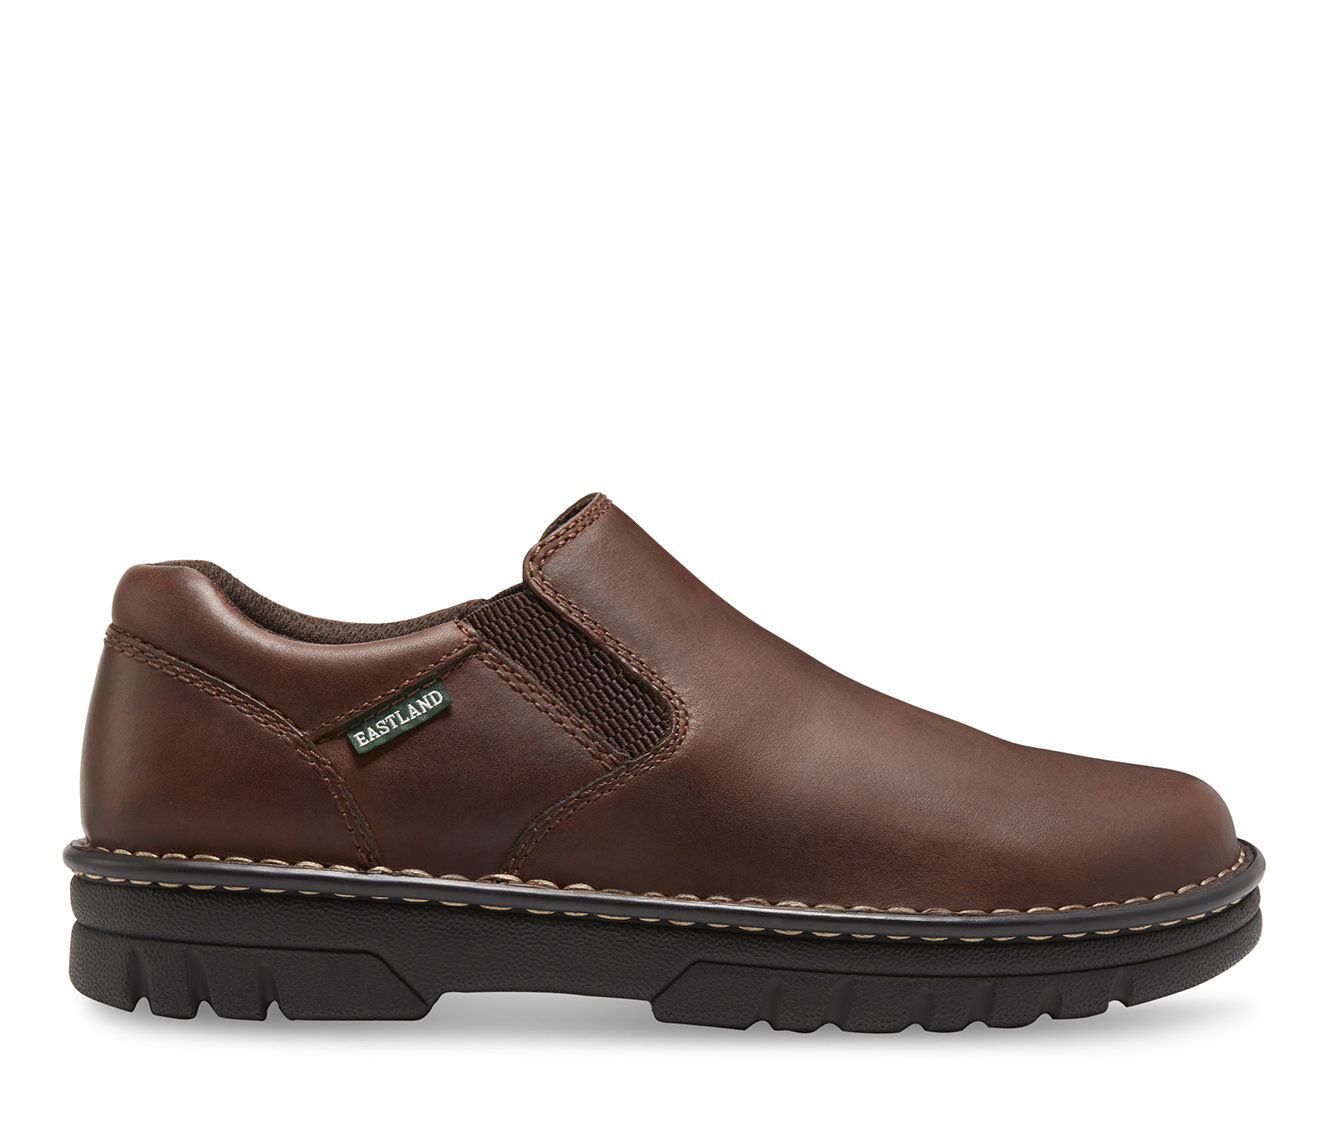 Men's Eastland Newport S/O Slip-On Shoes Brown